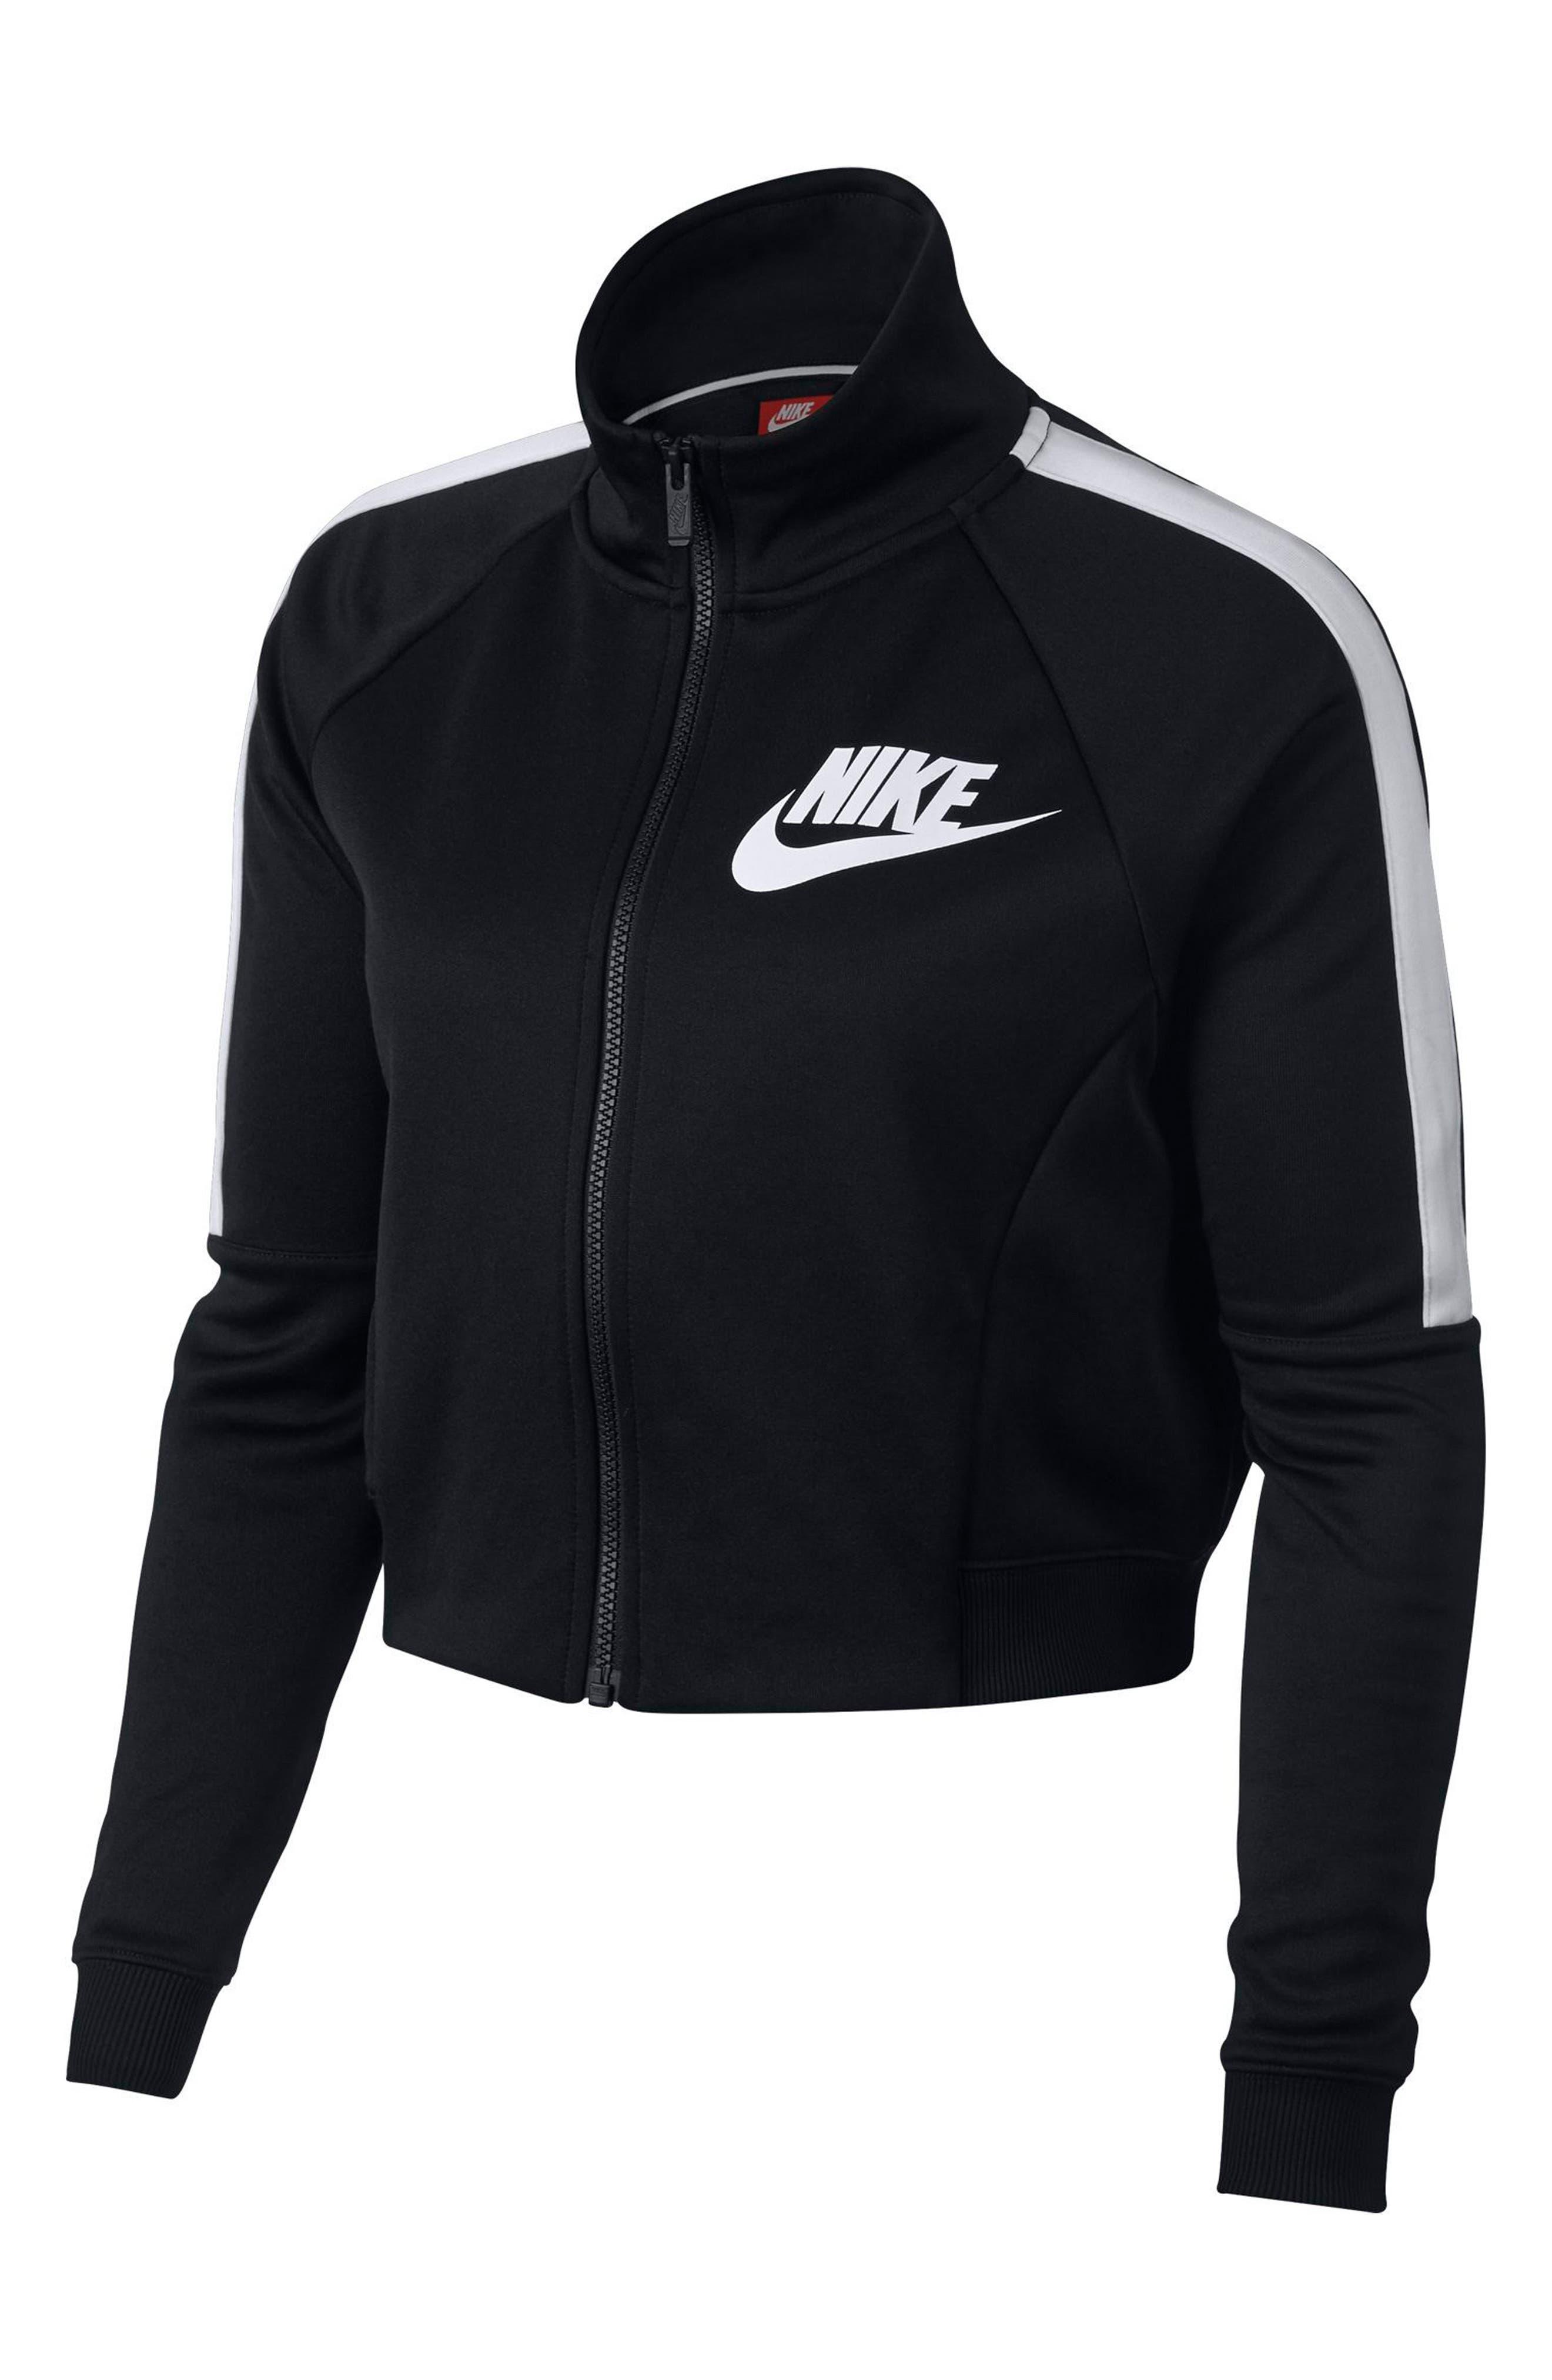 Sportswear N98 Jacket,                             Alternate thumbnail 14, color,